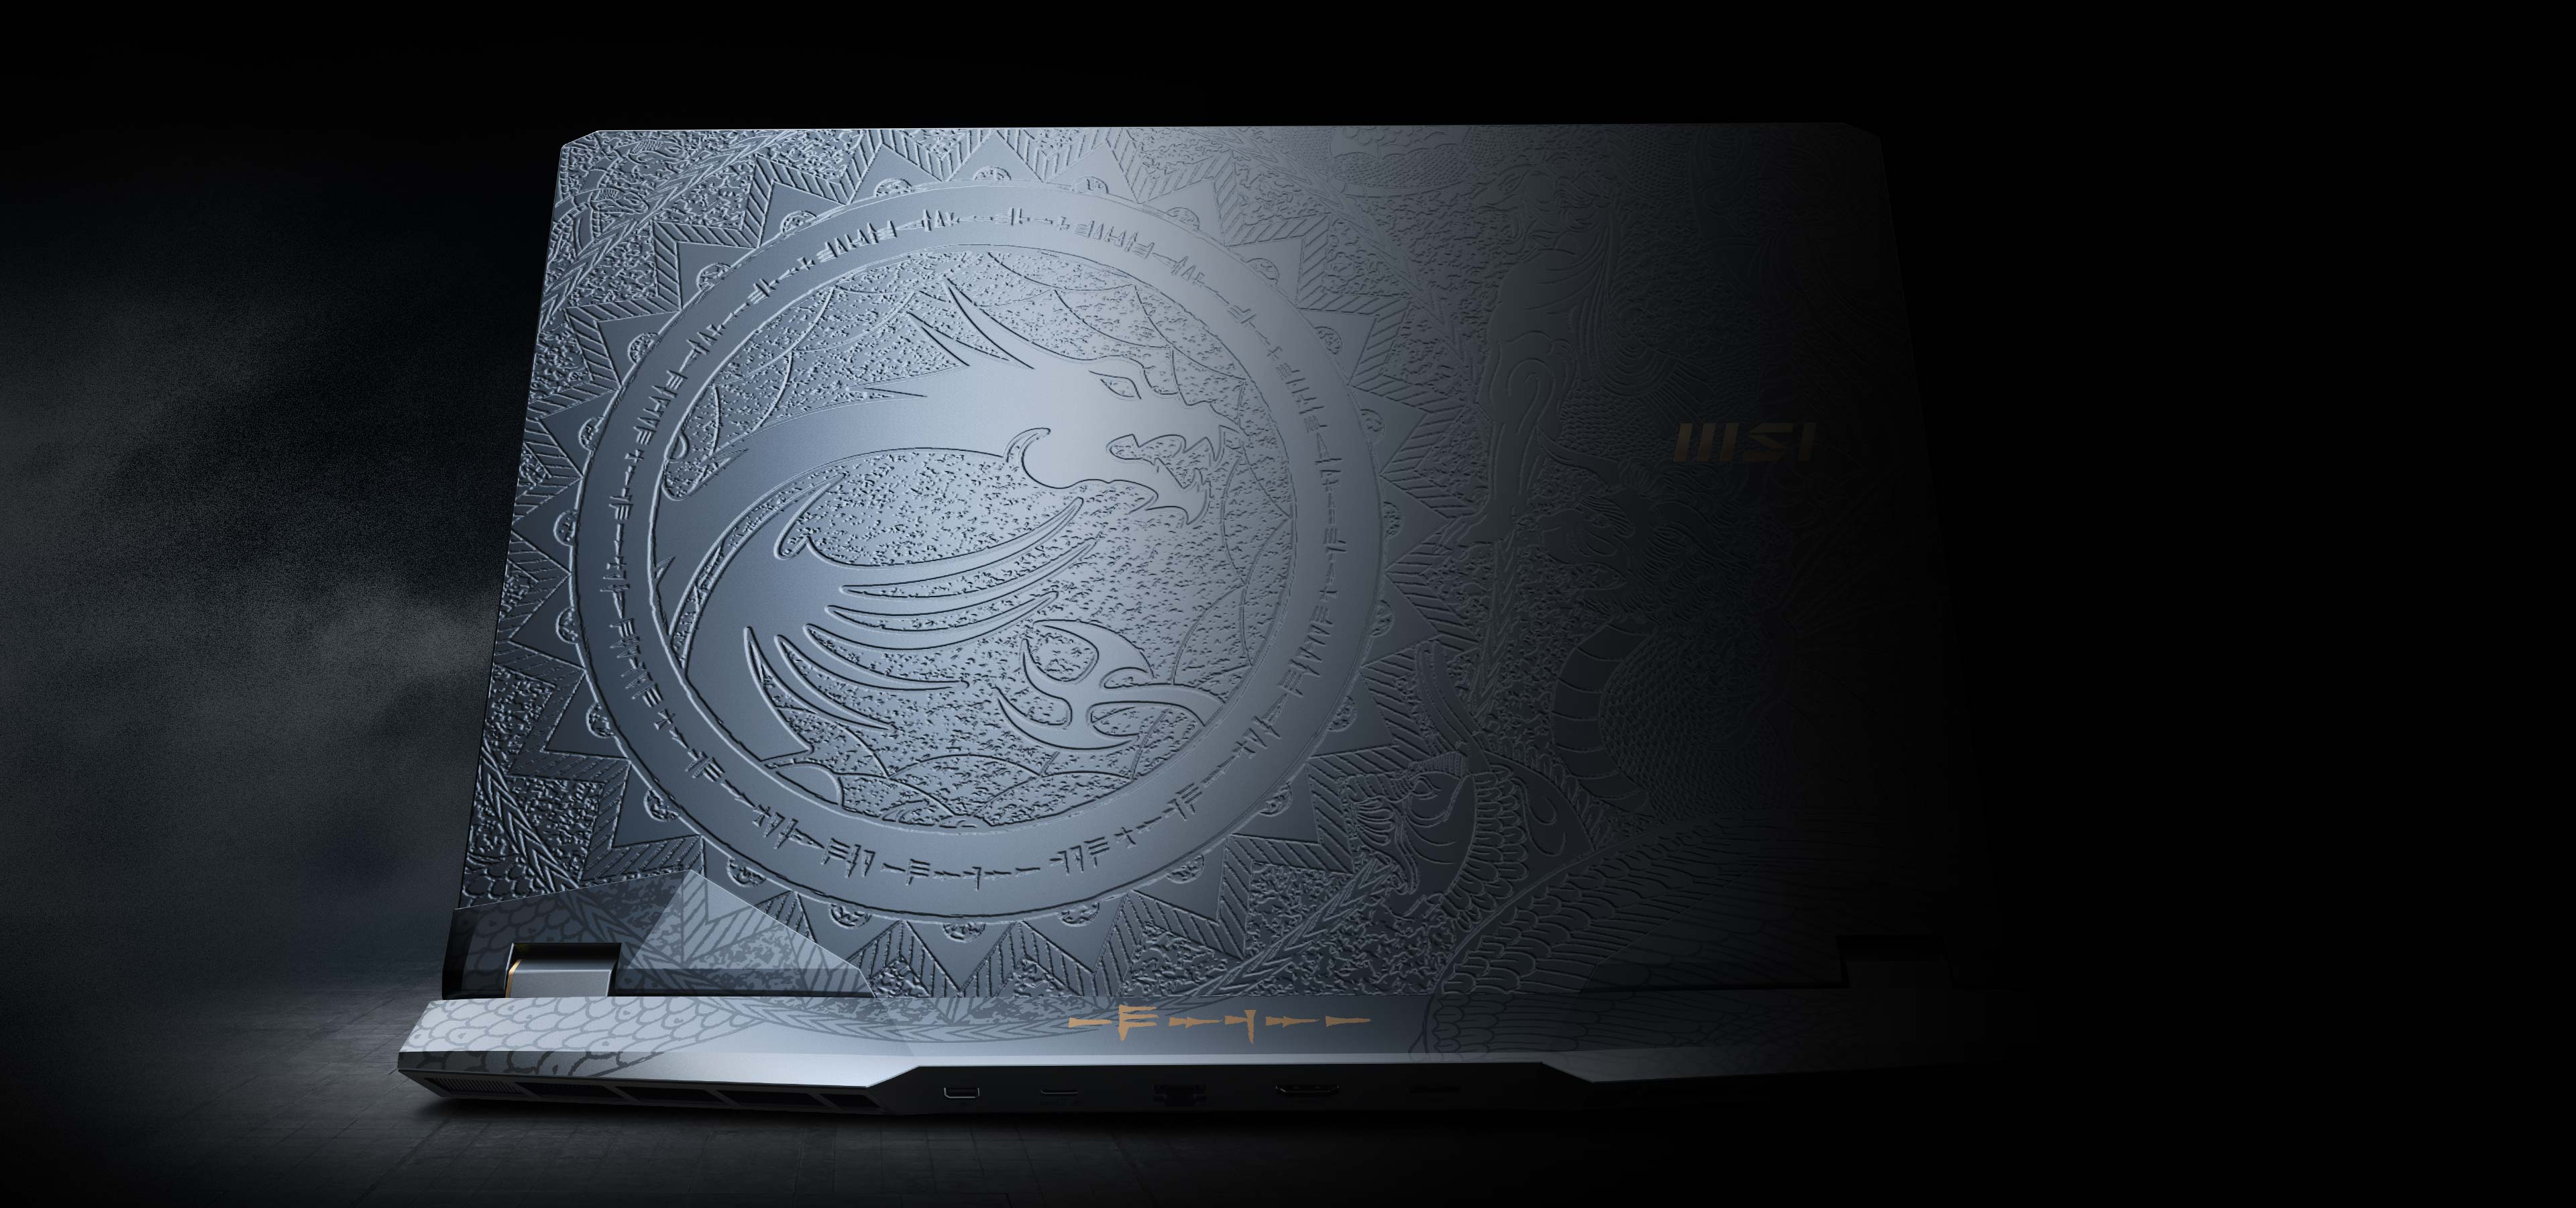 ge76 raider laptop design